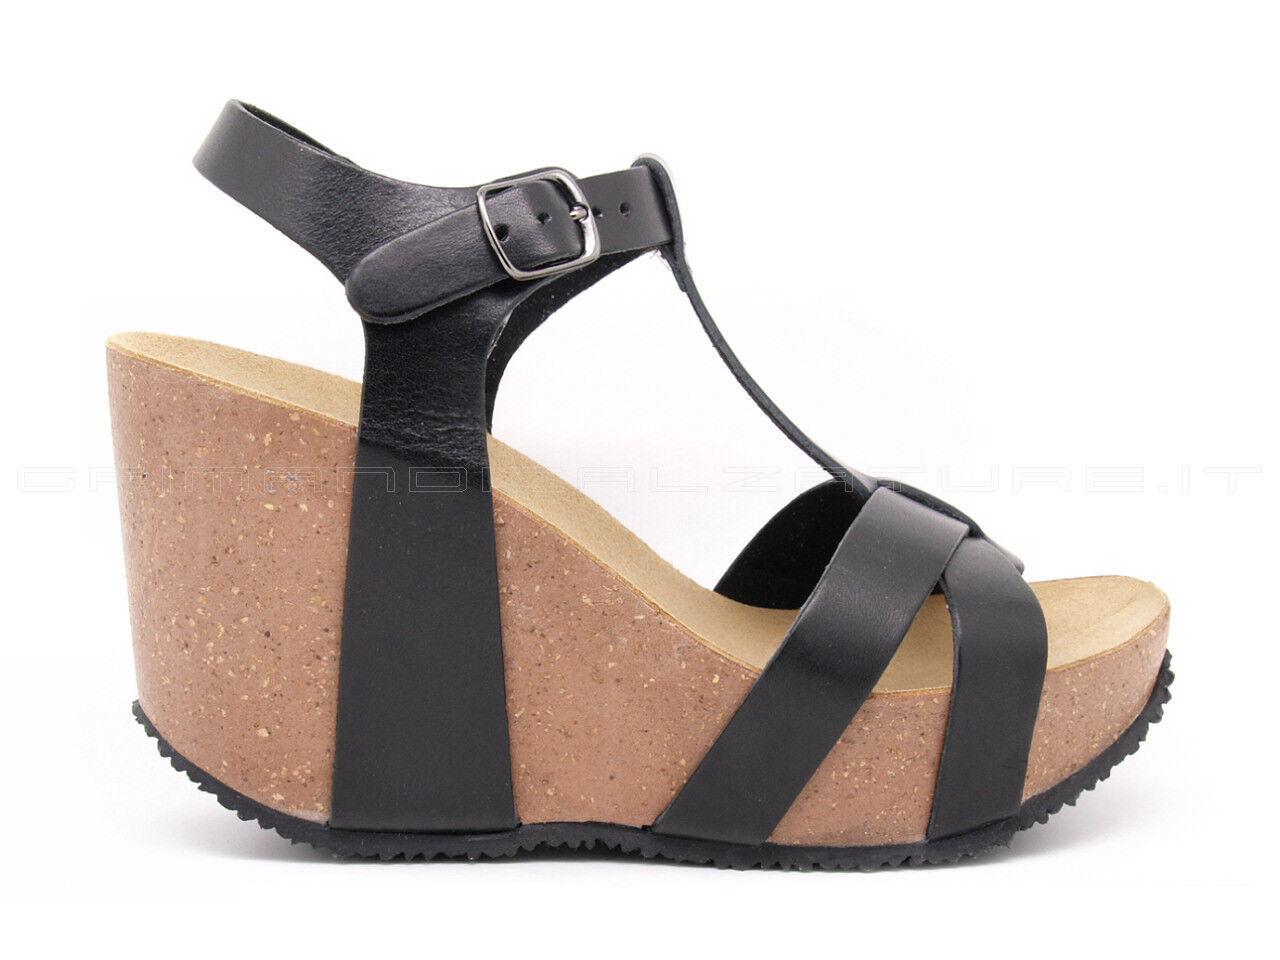 BioNatura sandalo T-Bar zeppa alta in pelle liscia nera con cinturino regolabile